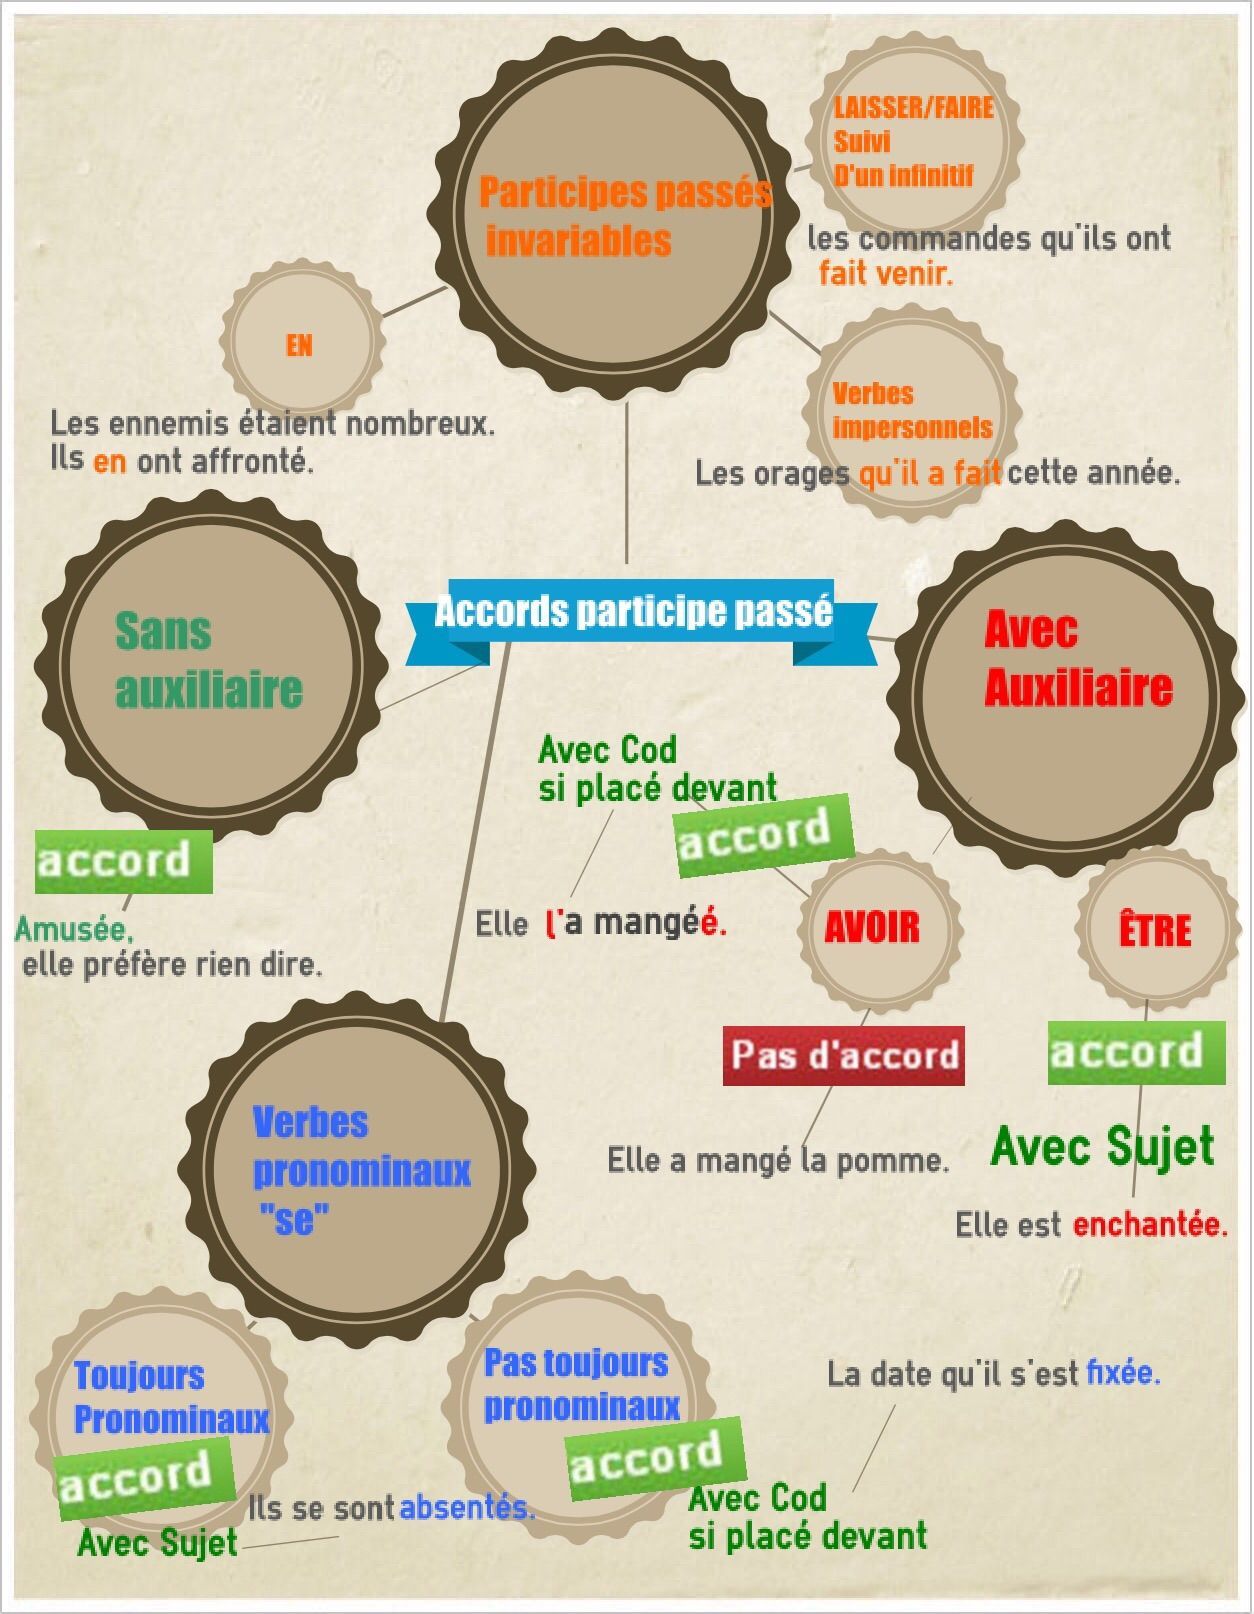 Carte Mentale Accord Du Participe Passe.Accord Des Participes Passes Participes Passes French